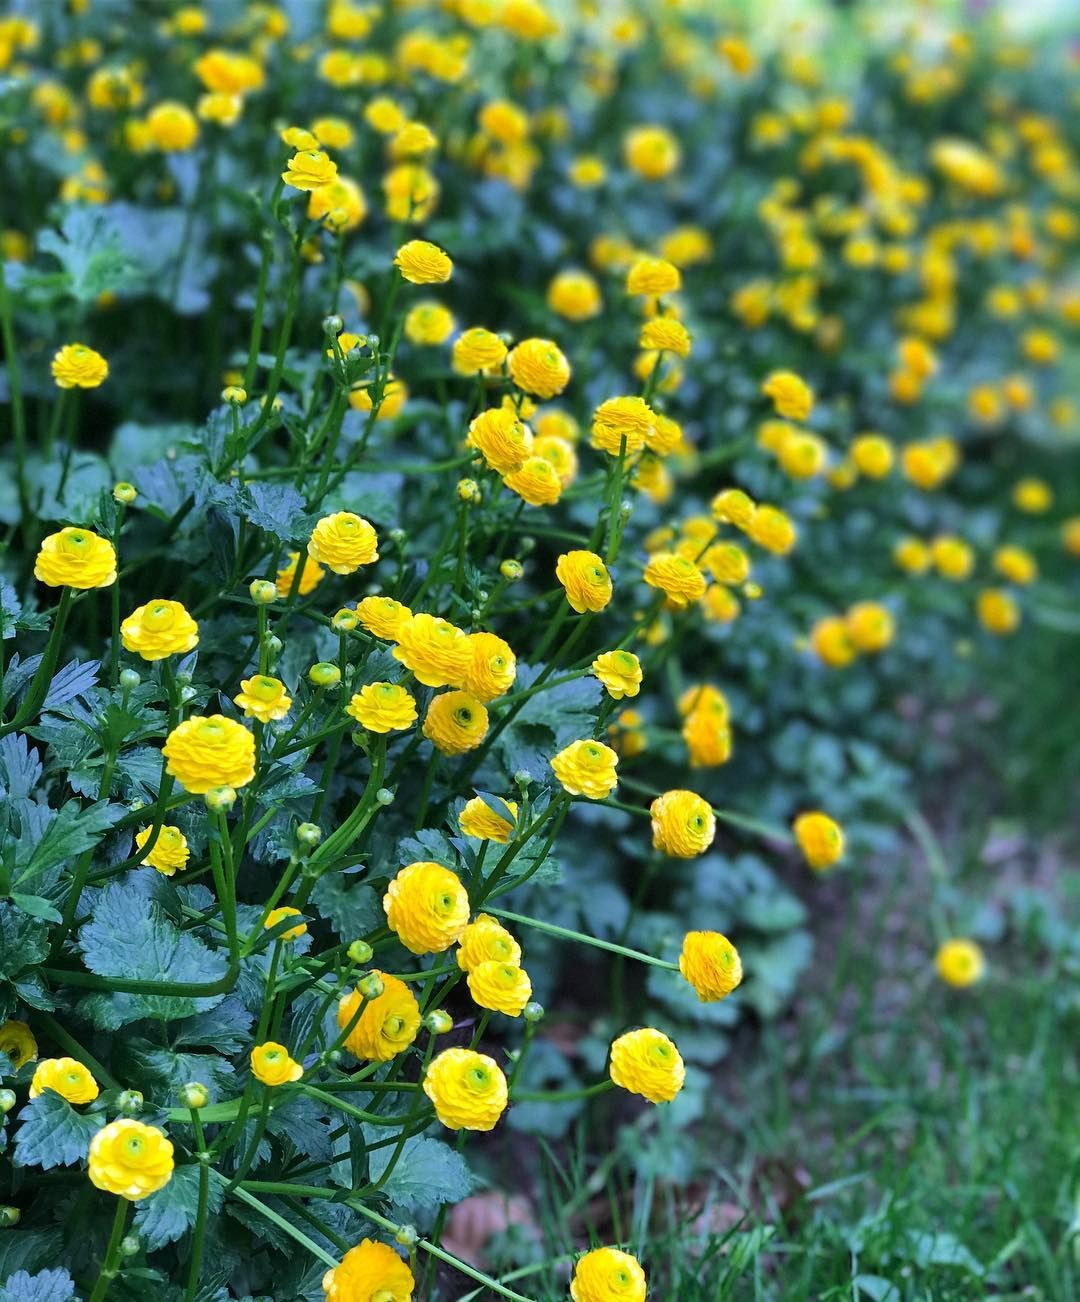 A Favorite From Childhood Ranunculus Acris Flore Pleno I Had A Well Established Drift In My Old Garden Originally Ta Plants Sunny Ranunculus City Garden